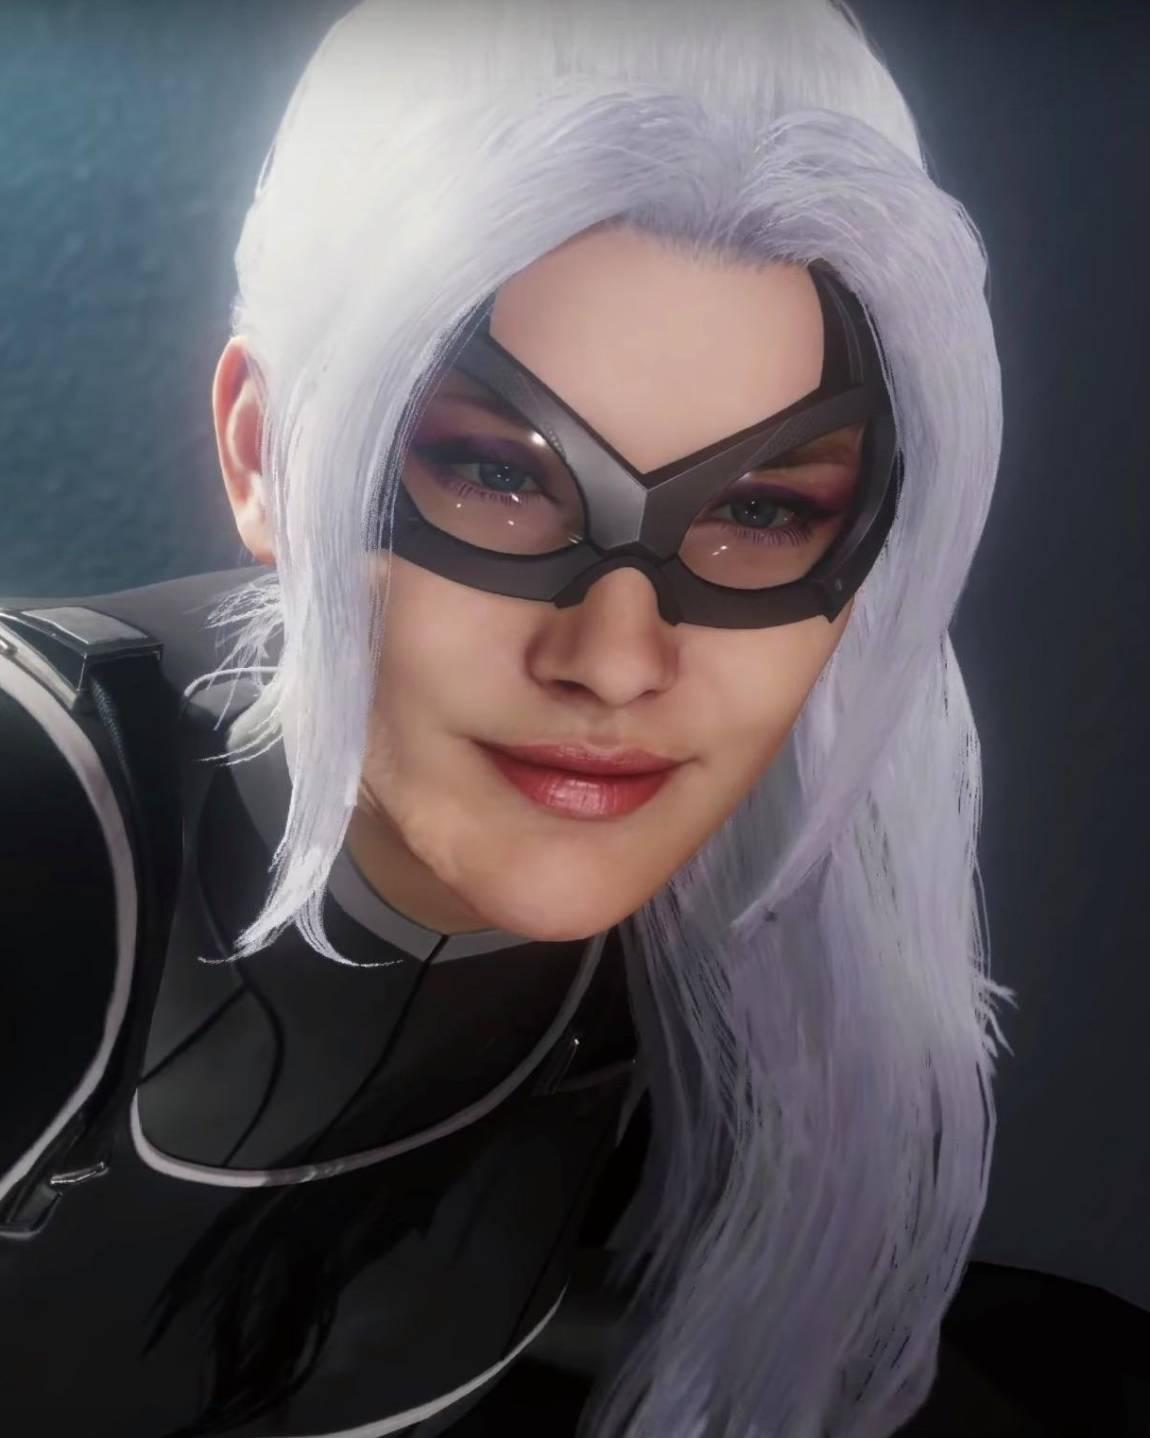 Amy Johnston spider-man black cat dlc: meet amy johnston